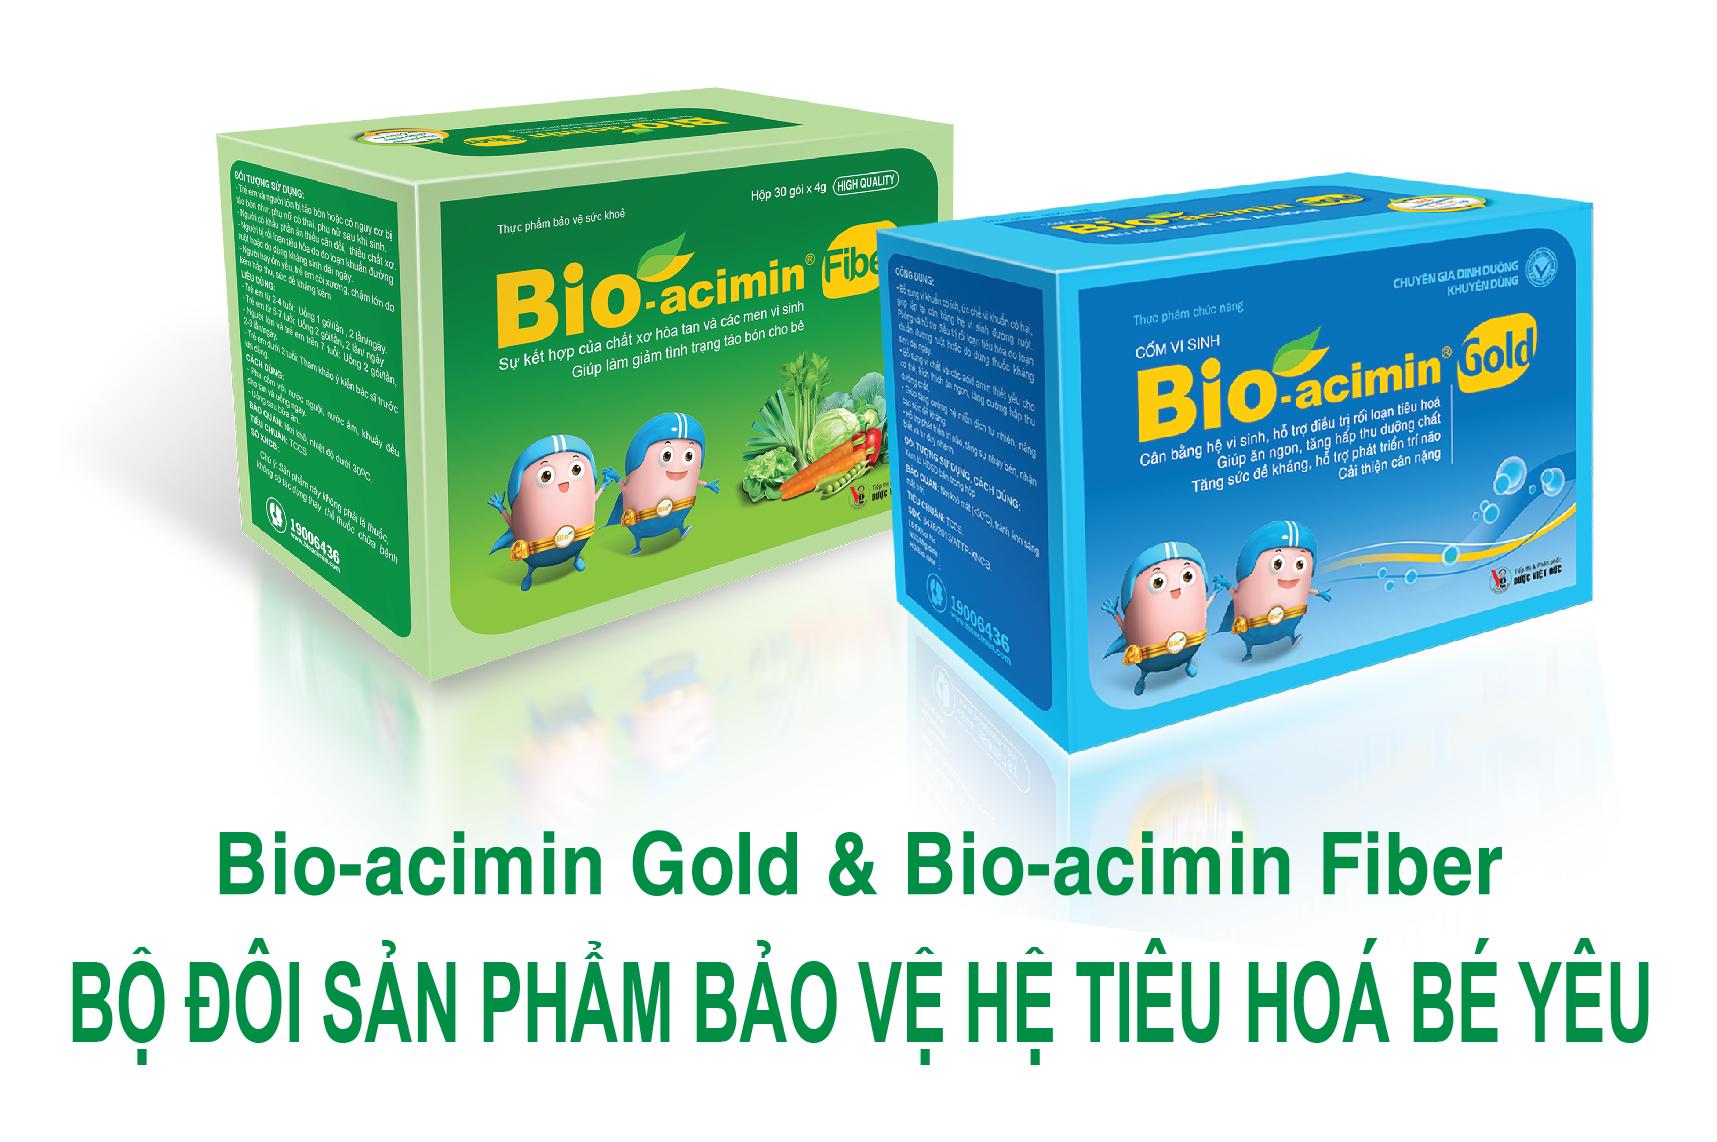 Bio-acimin Gold và Bio-acimin Fiber